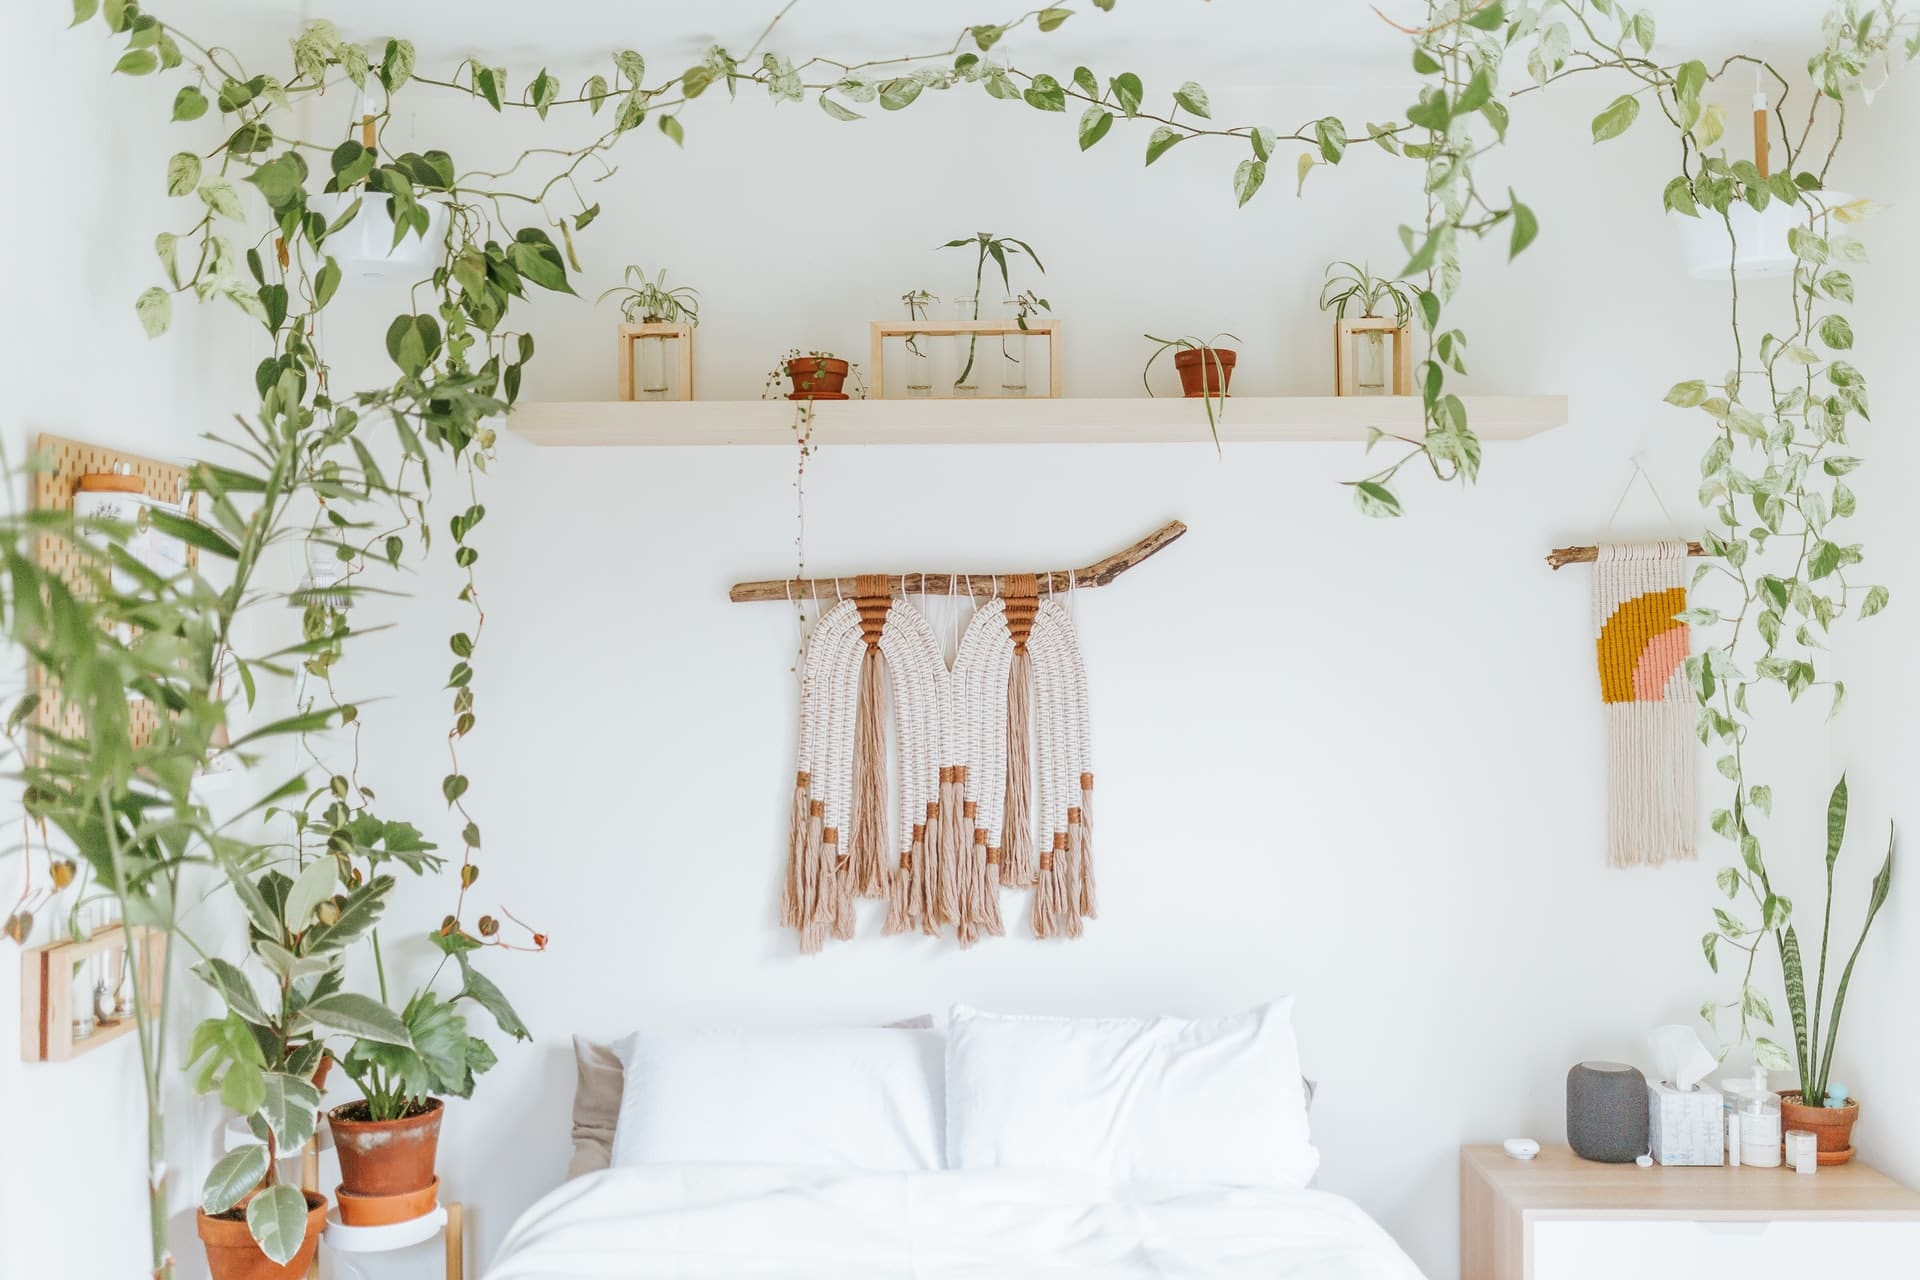 Boho Bedroom Ideas - Featured